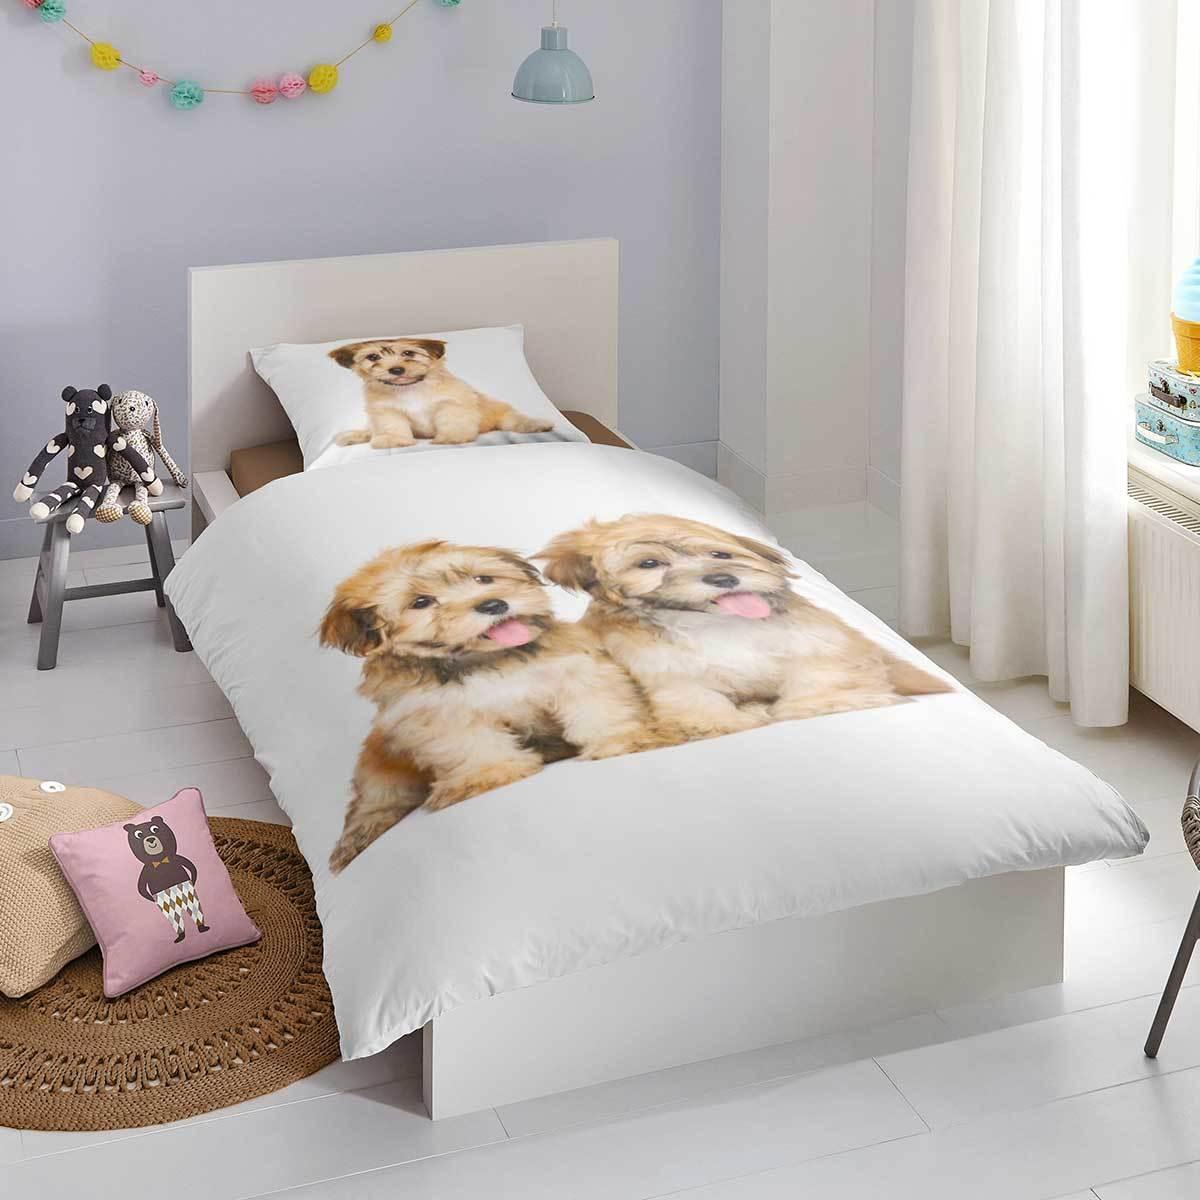 Good Morning Flanell Bettwäsche Hunde